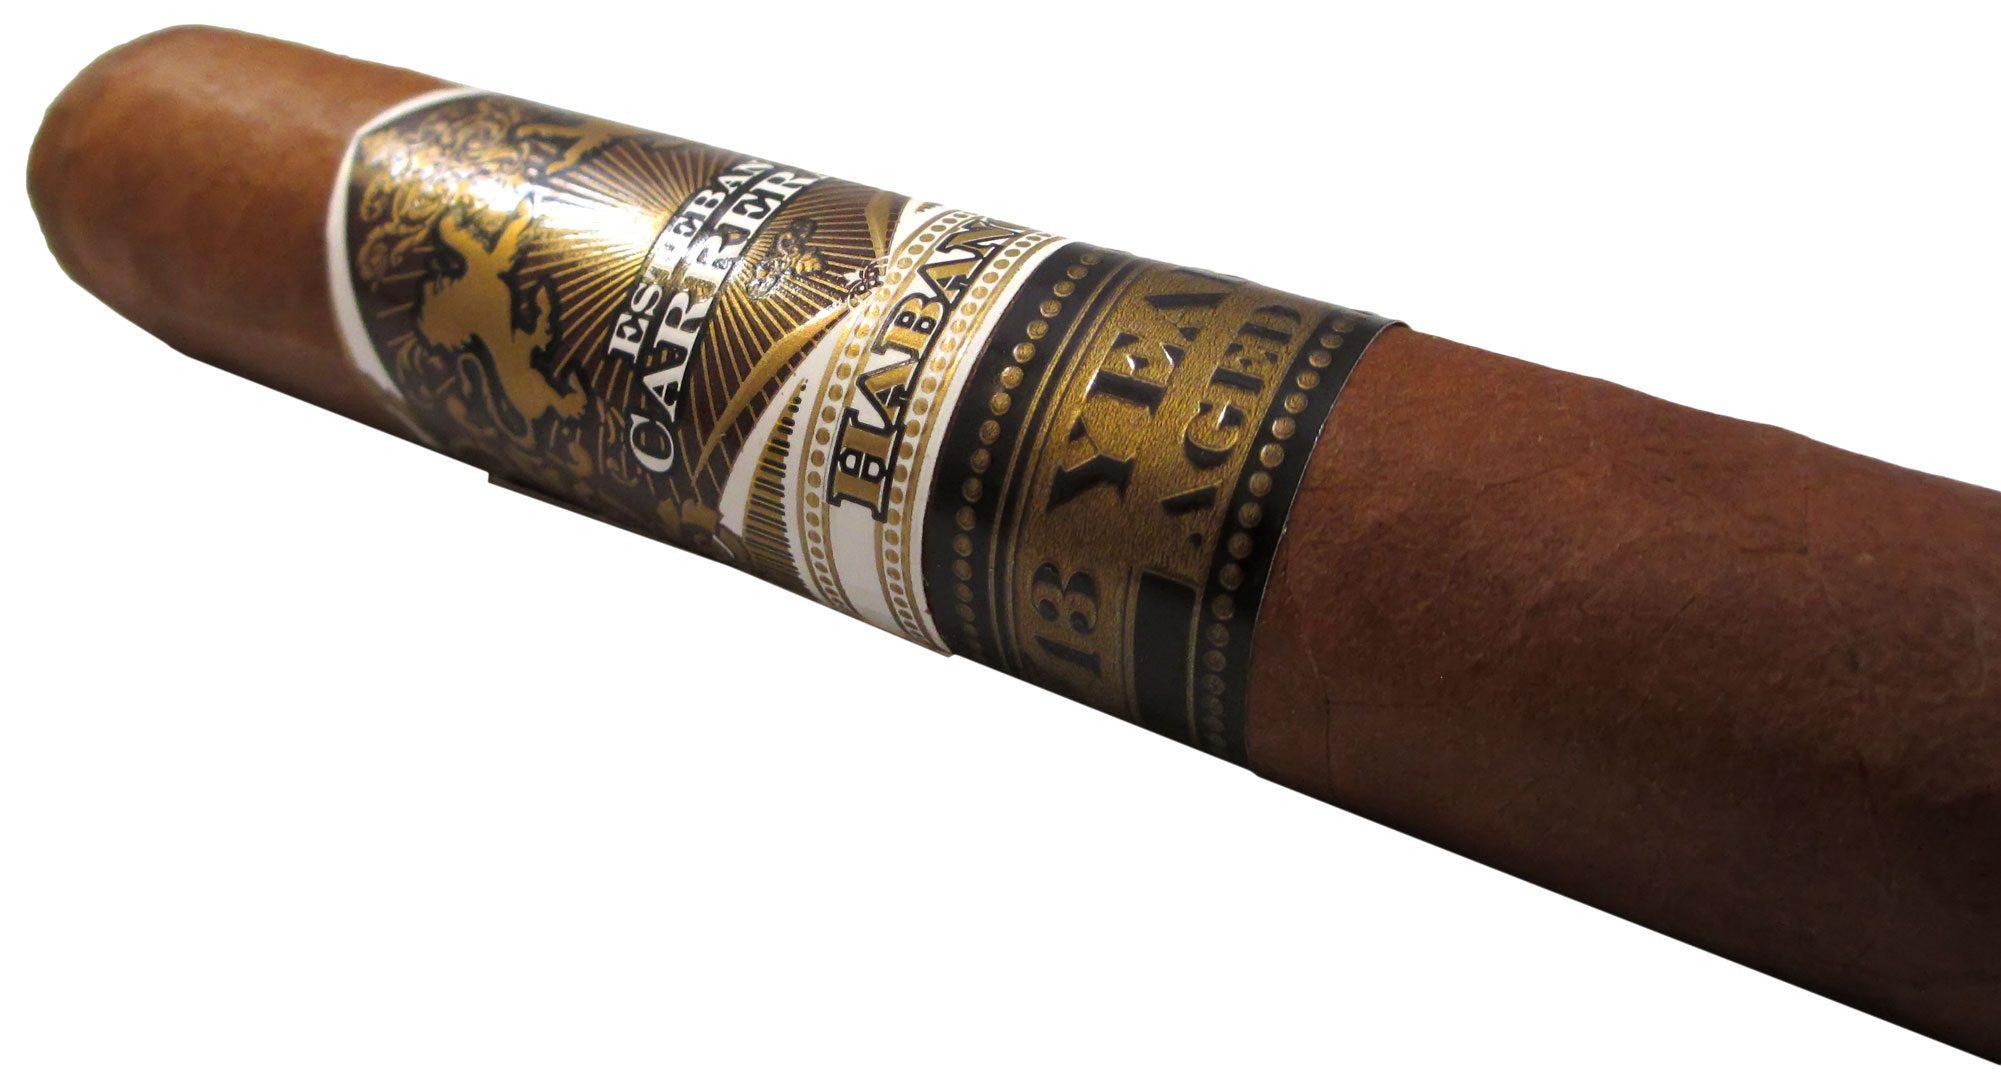 Blind Cigar Review: Esteban Carreras | Habano Toro